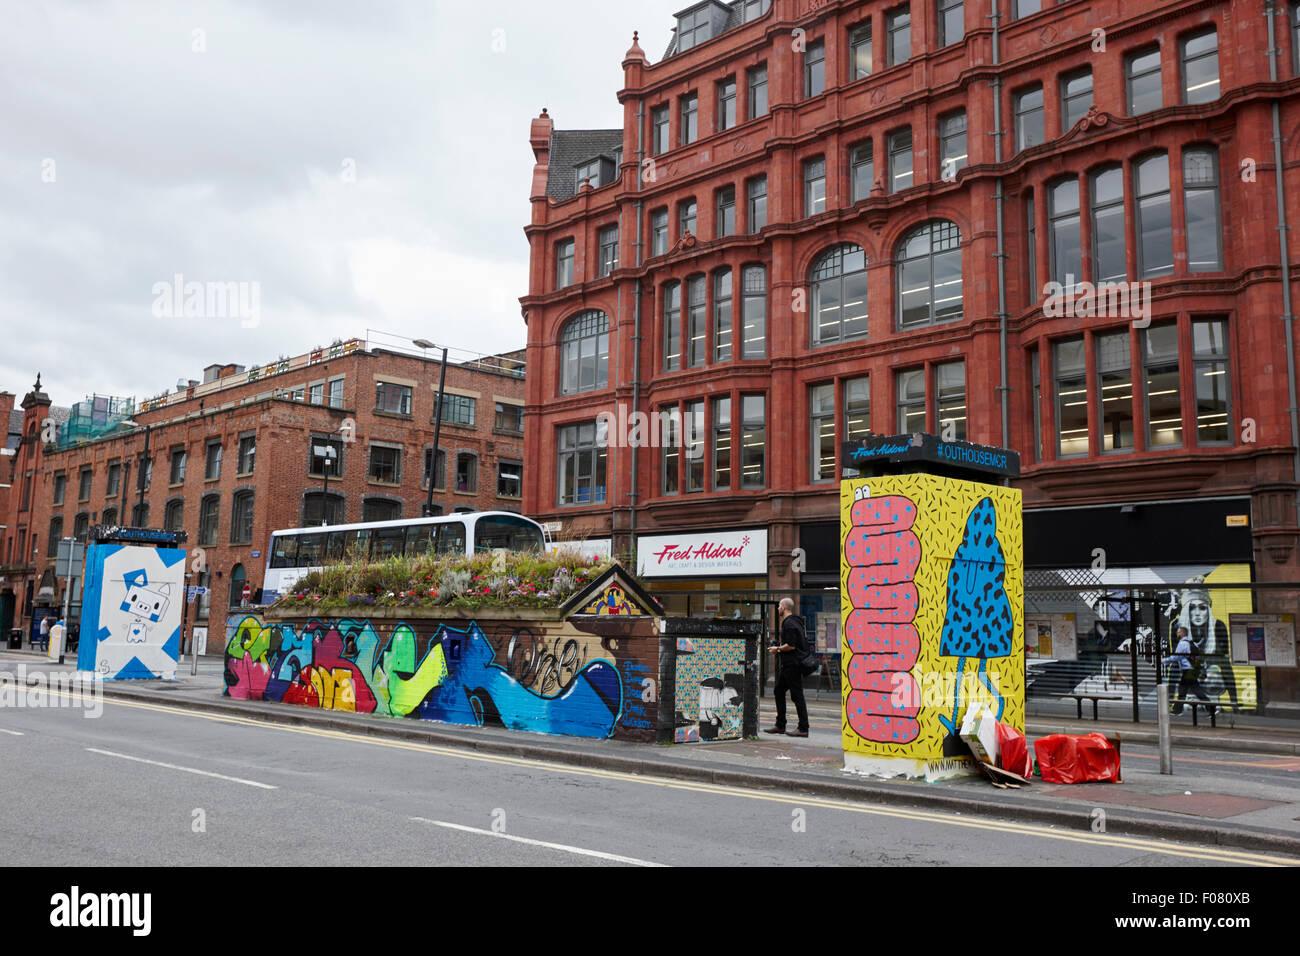 graffiti and street art in stevenson square Northern quarter Manchester uk Stock Photo